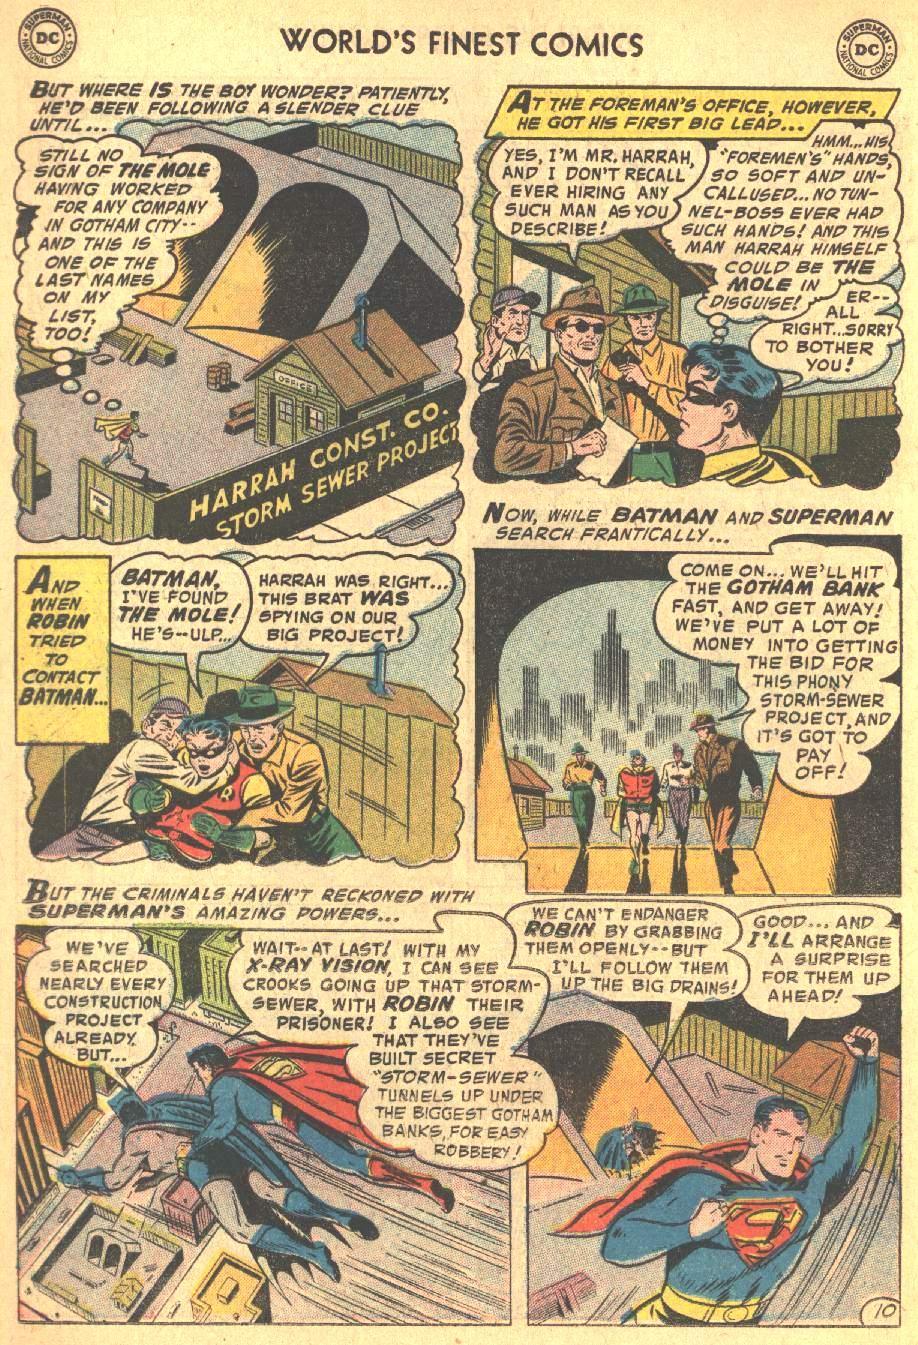 Read online World's Finest Comics comic -  Issue #80 - 12